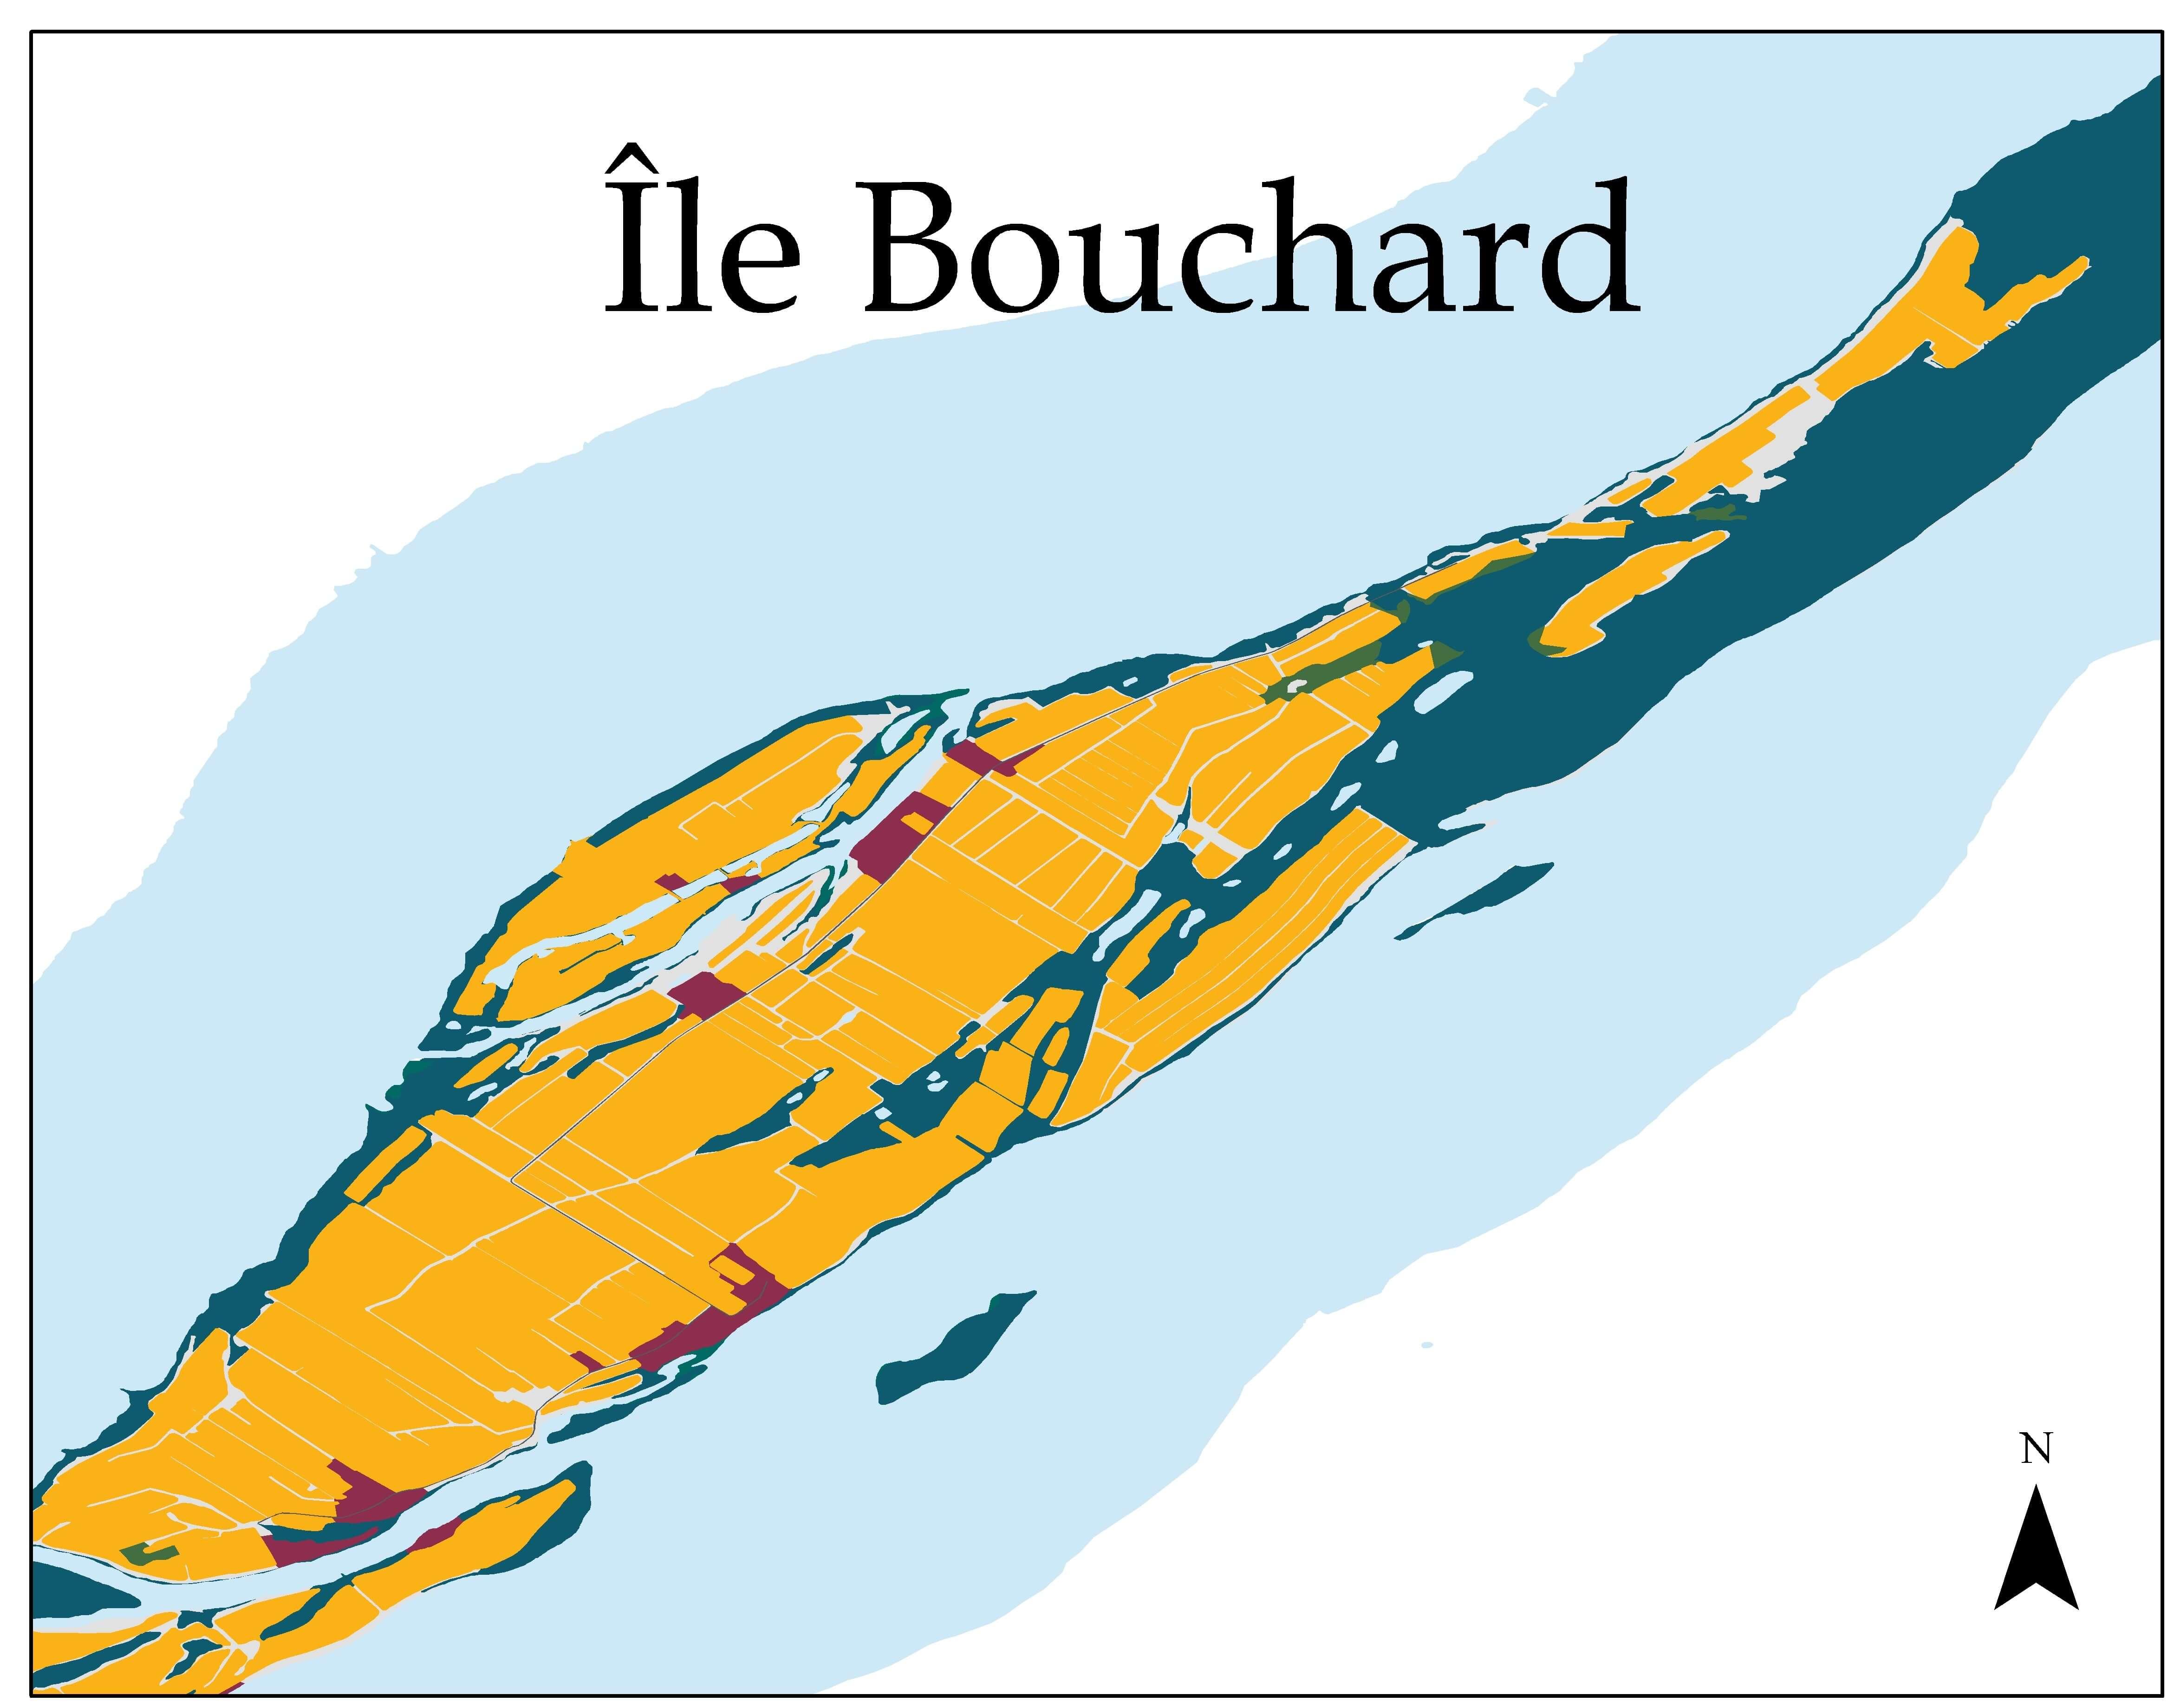 Ile Bouchard